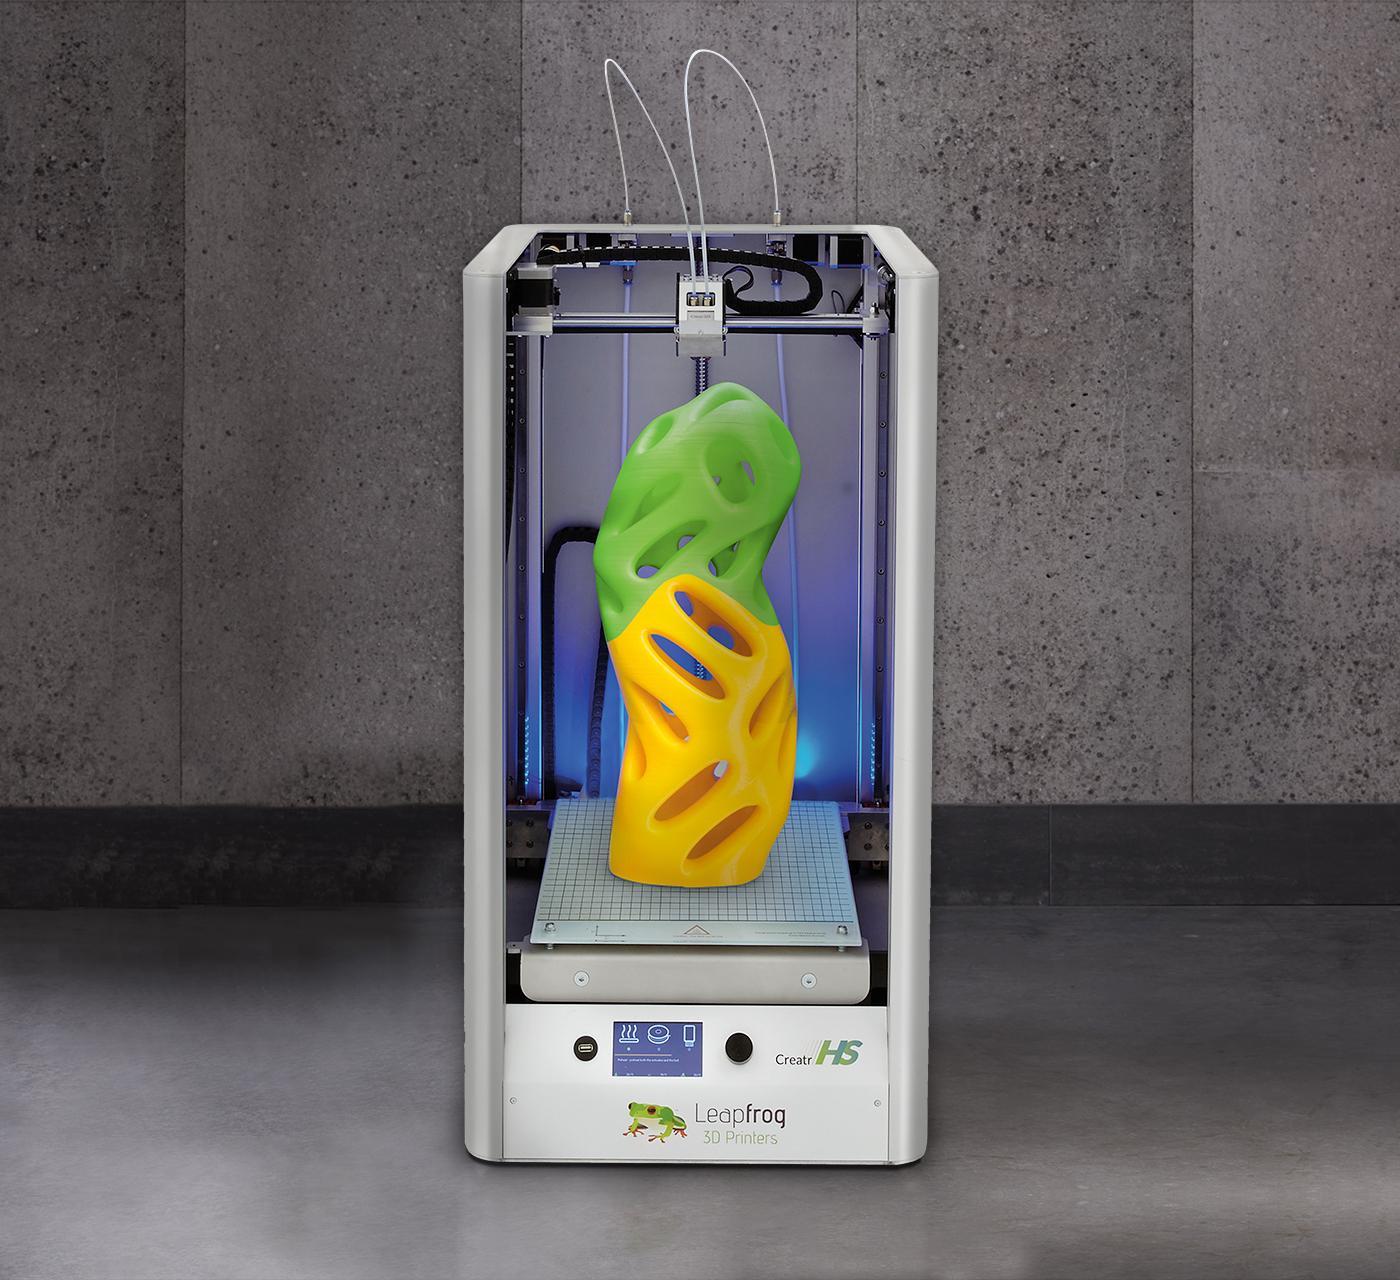 Leapfrog-3D-Printer-Creatr-HS-XL.jpg